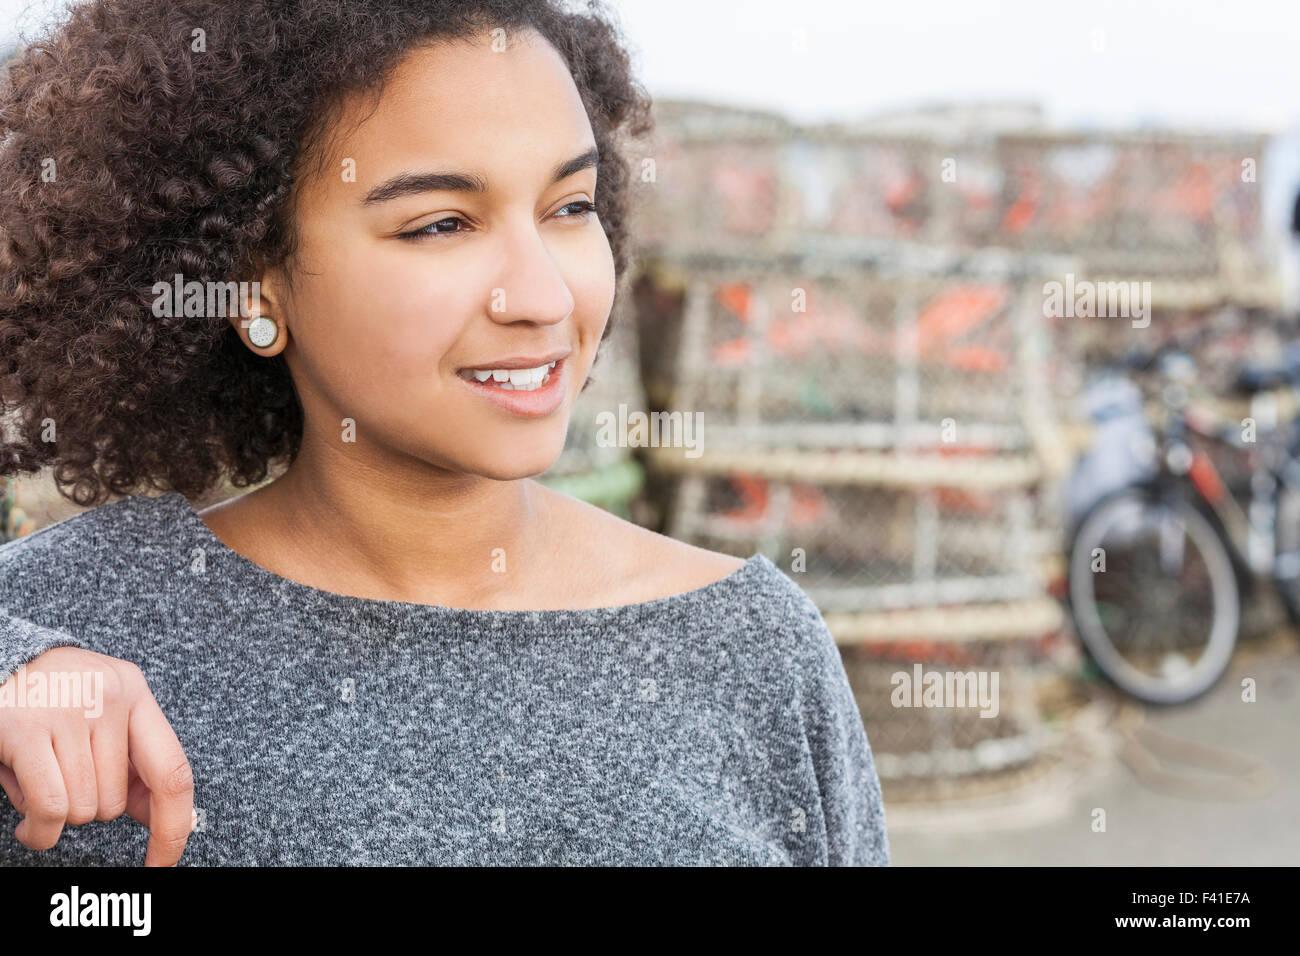 racial beauty african americans essay Mom sues walmart for 'segregating' african-american beauty products, alleges racial discrimination.